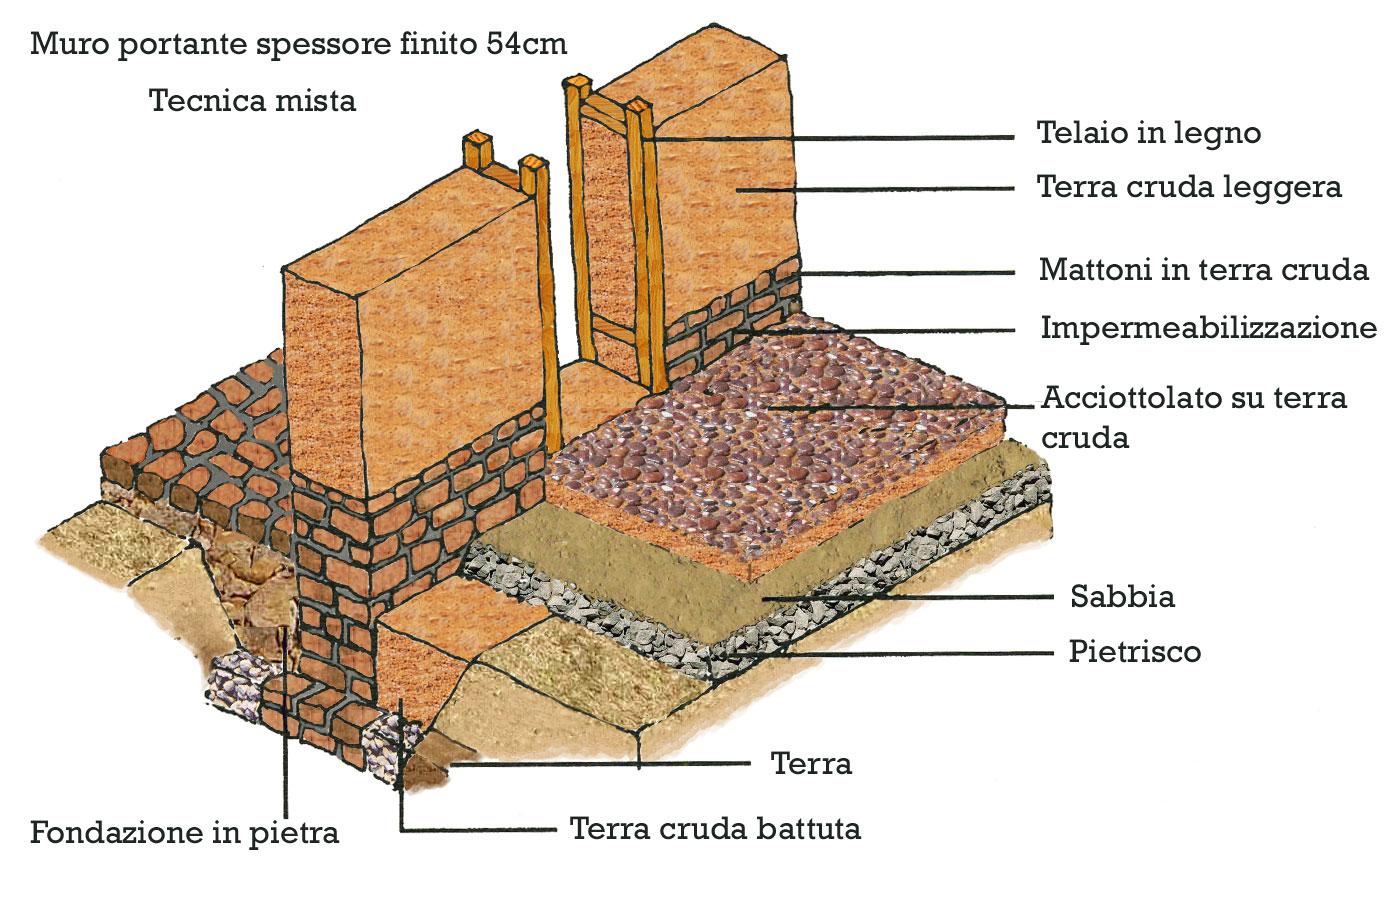 Muratura portante terra cruda pearltrees - Casa in muratura portante ...